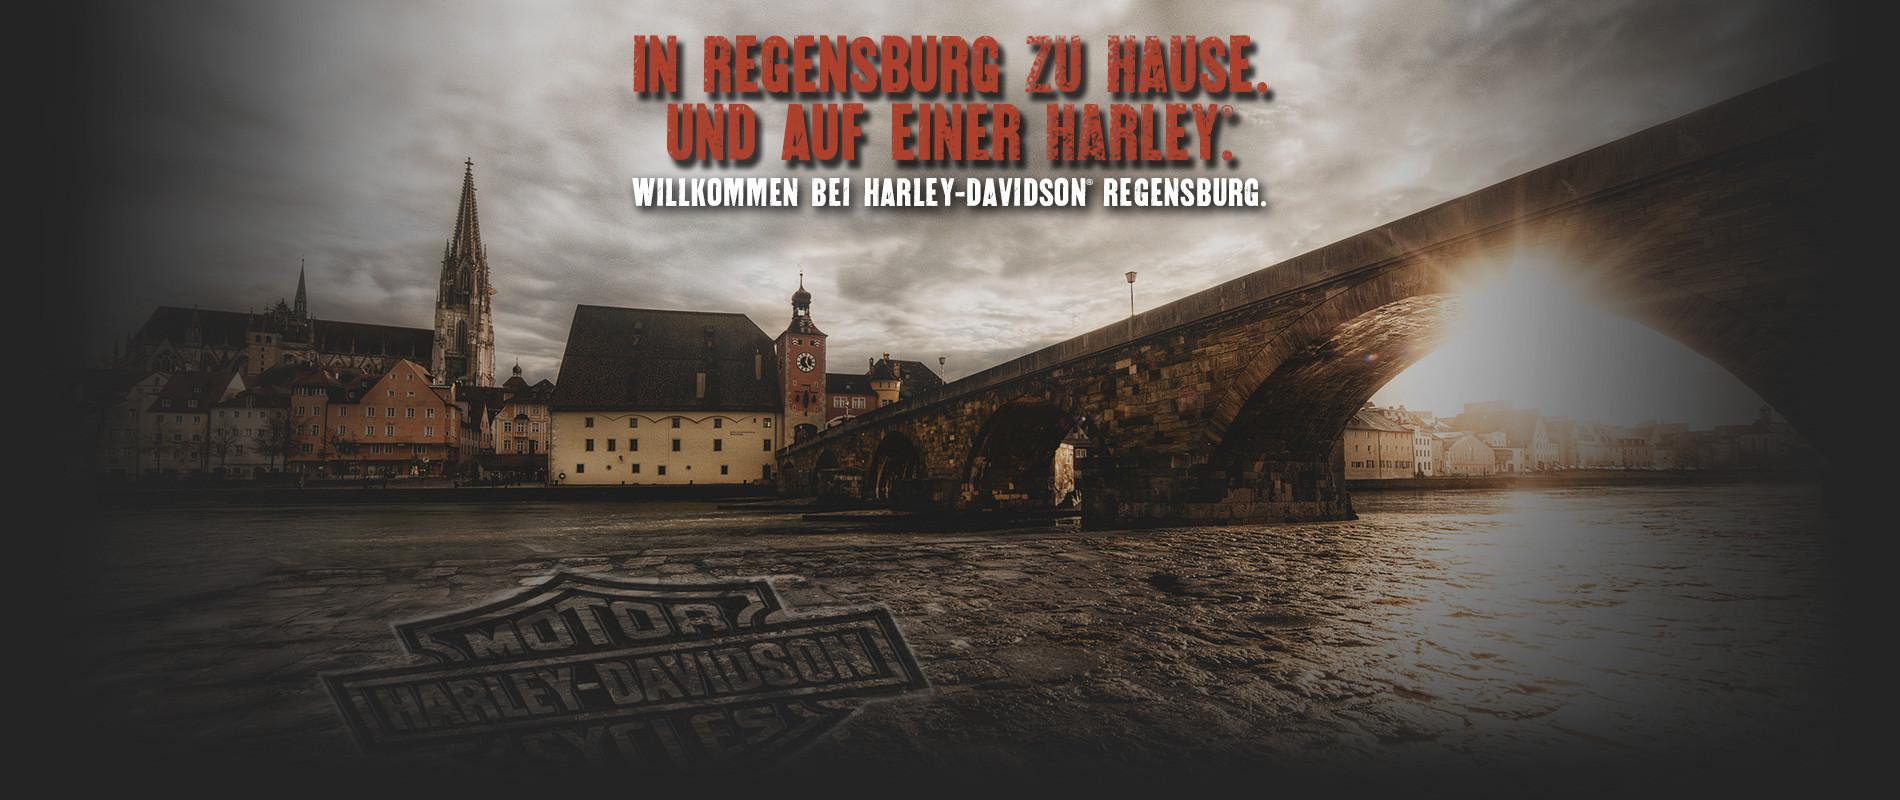 HD_Regensburg_Billboard_Wiedereroeffnung3_2015